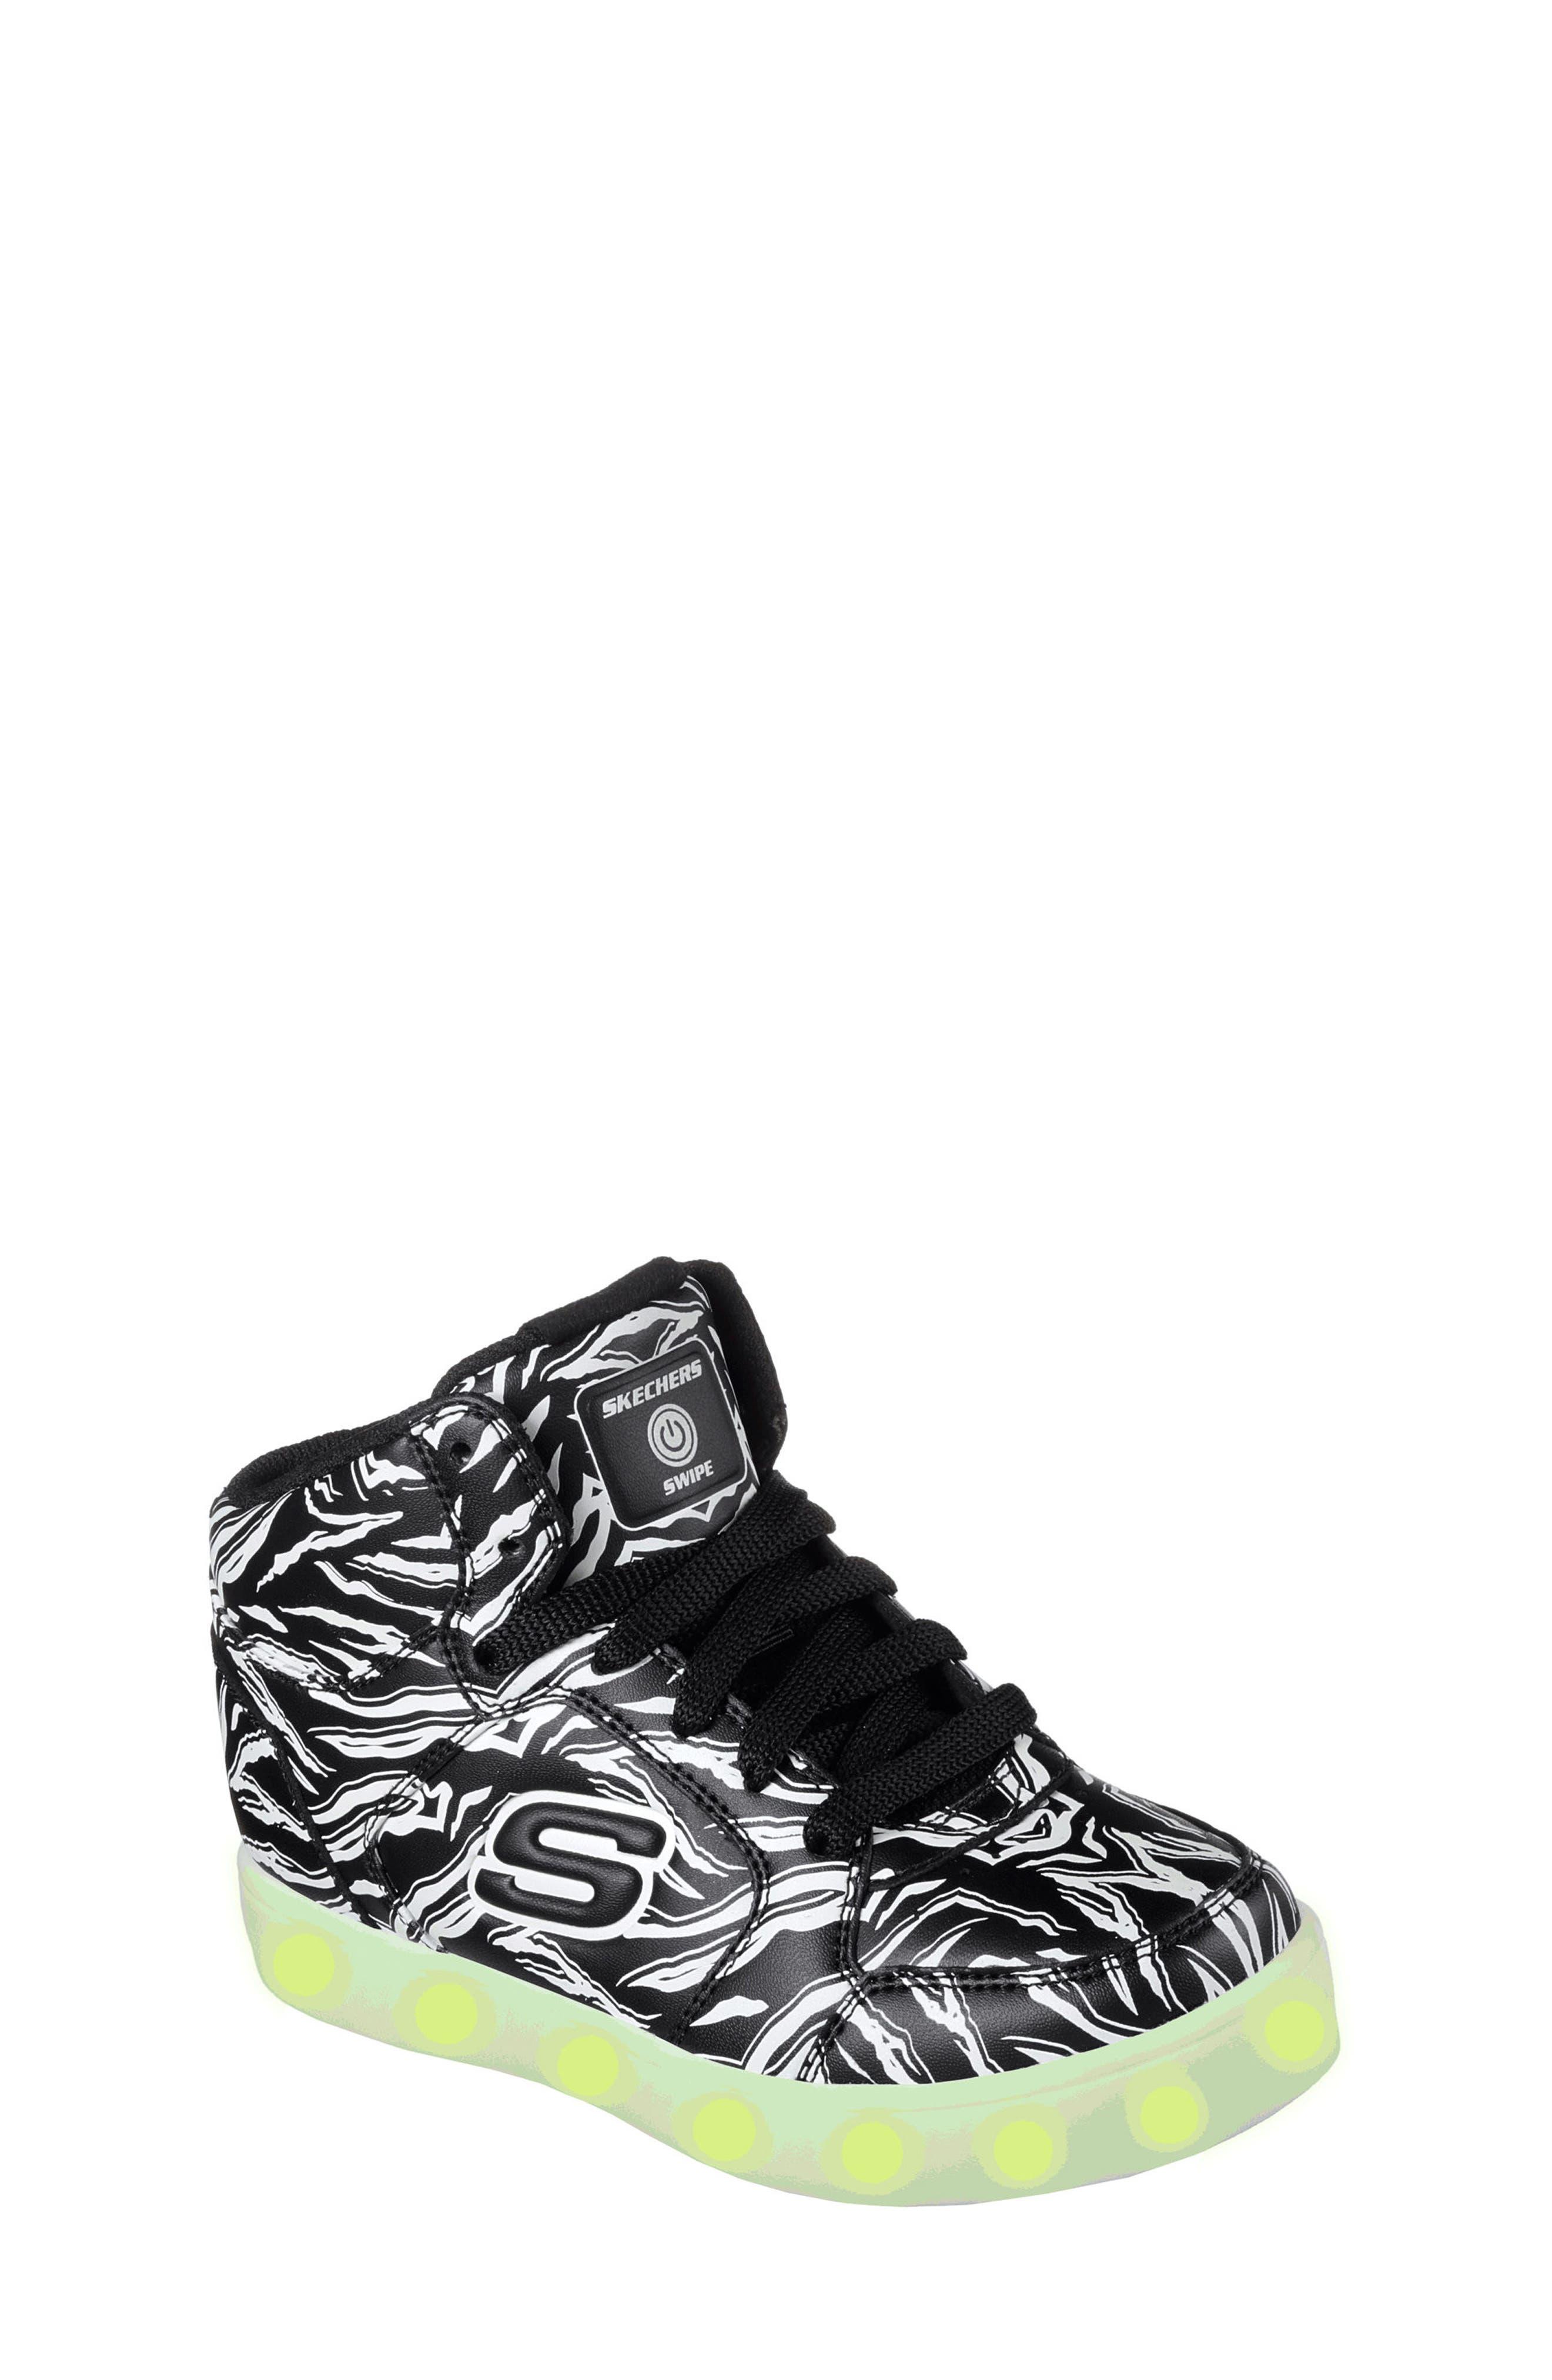 Energy Lights Glow in the Dark Sneaker,                             Alternate thumbnail 3, color,                             Black